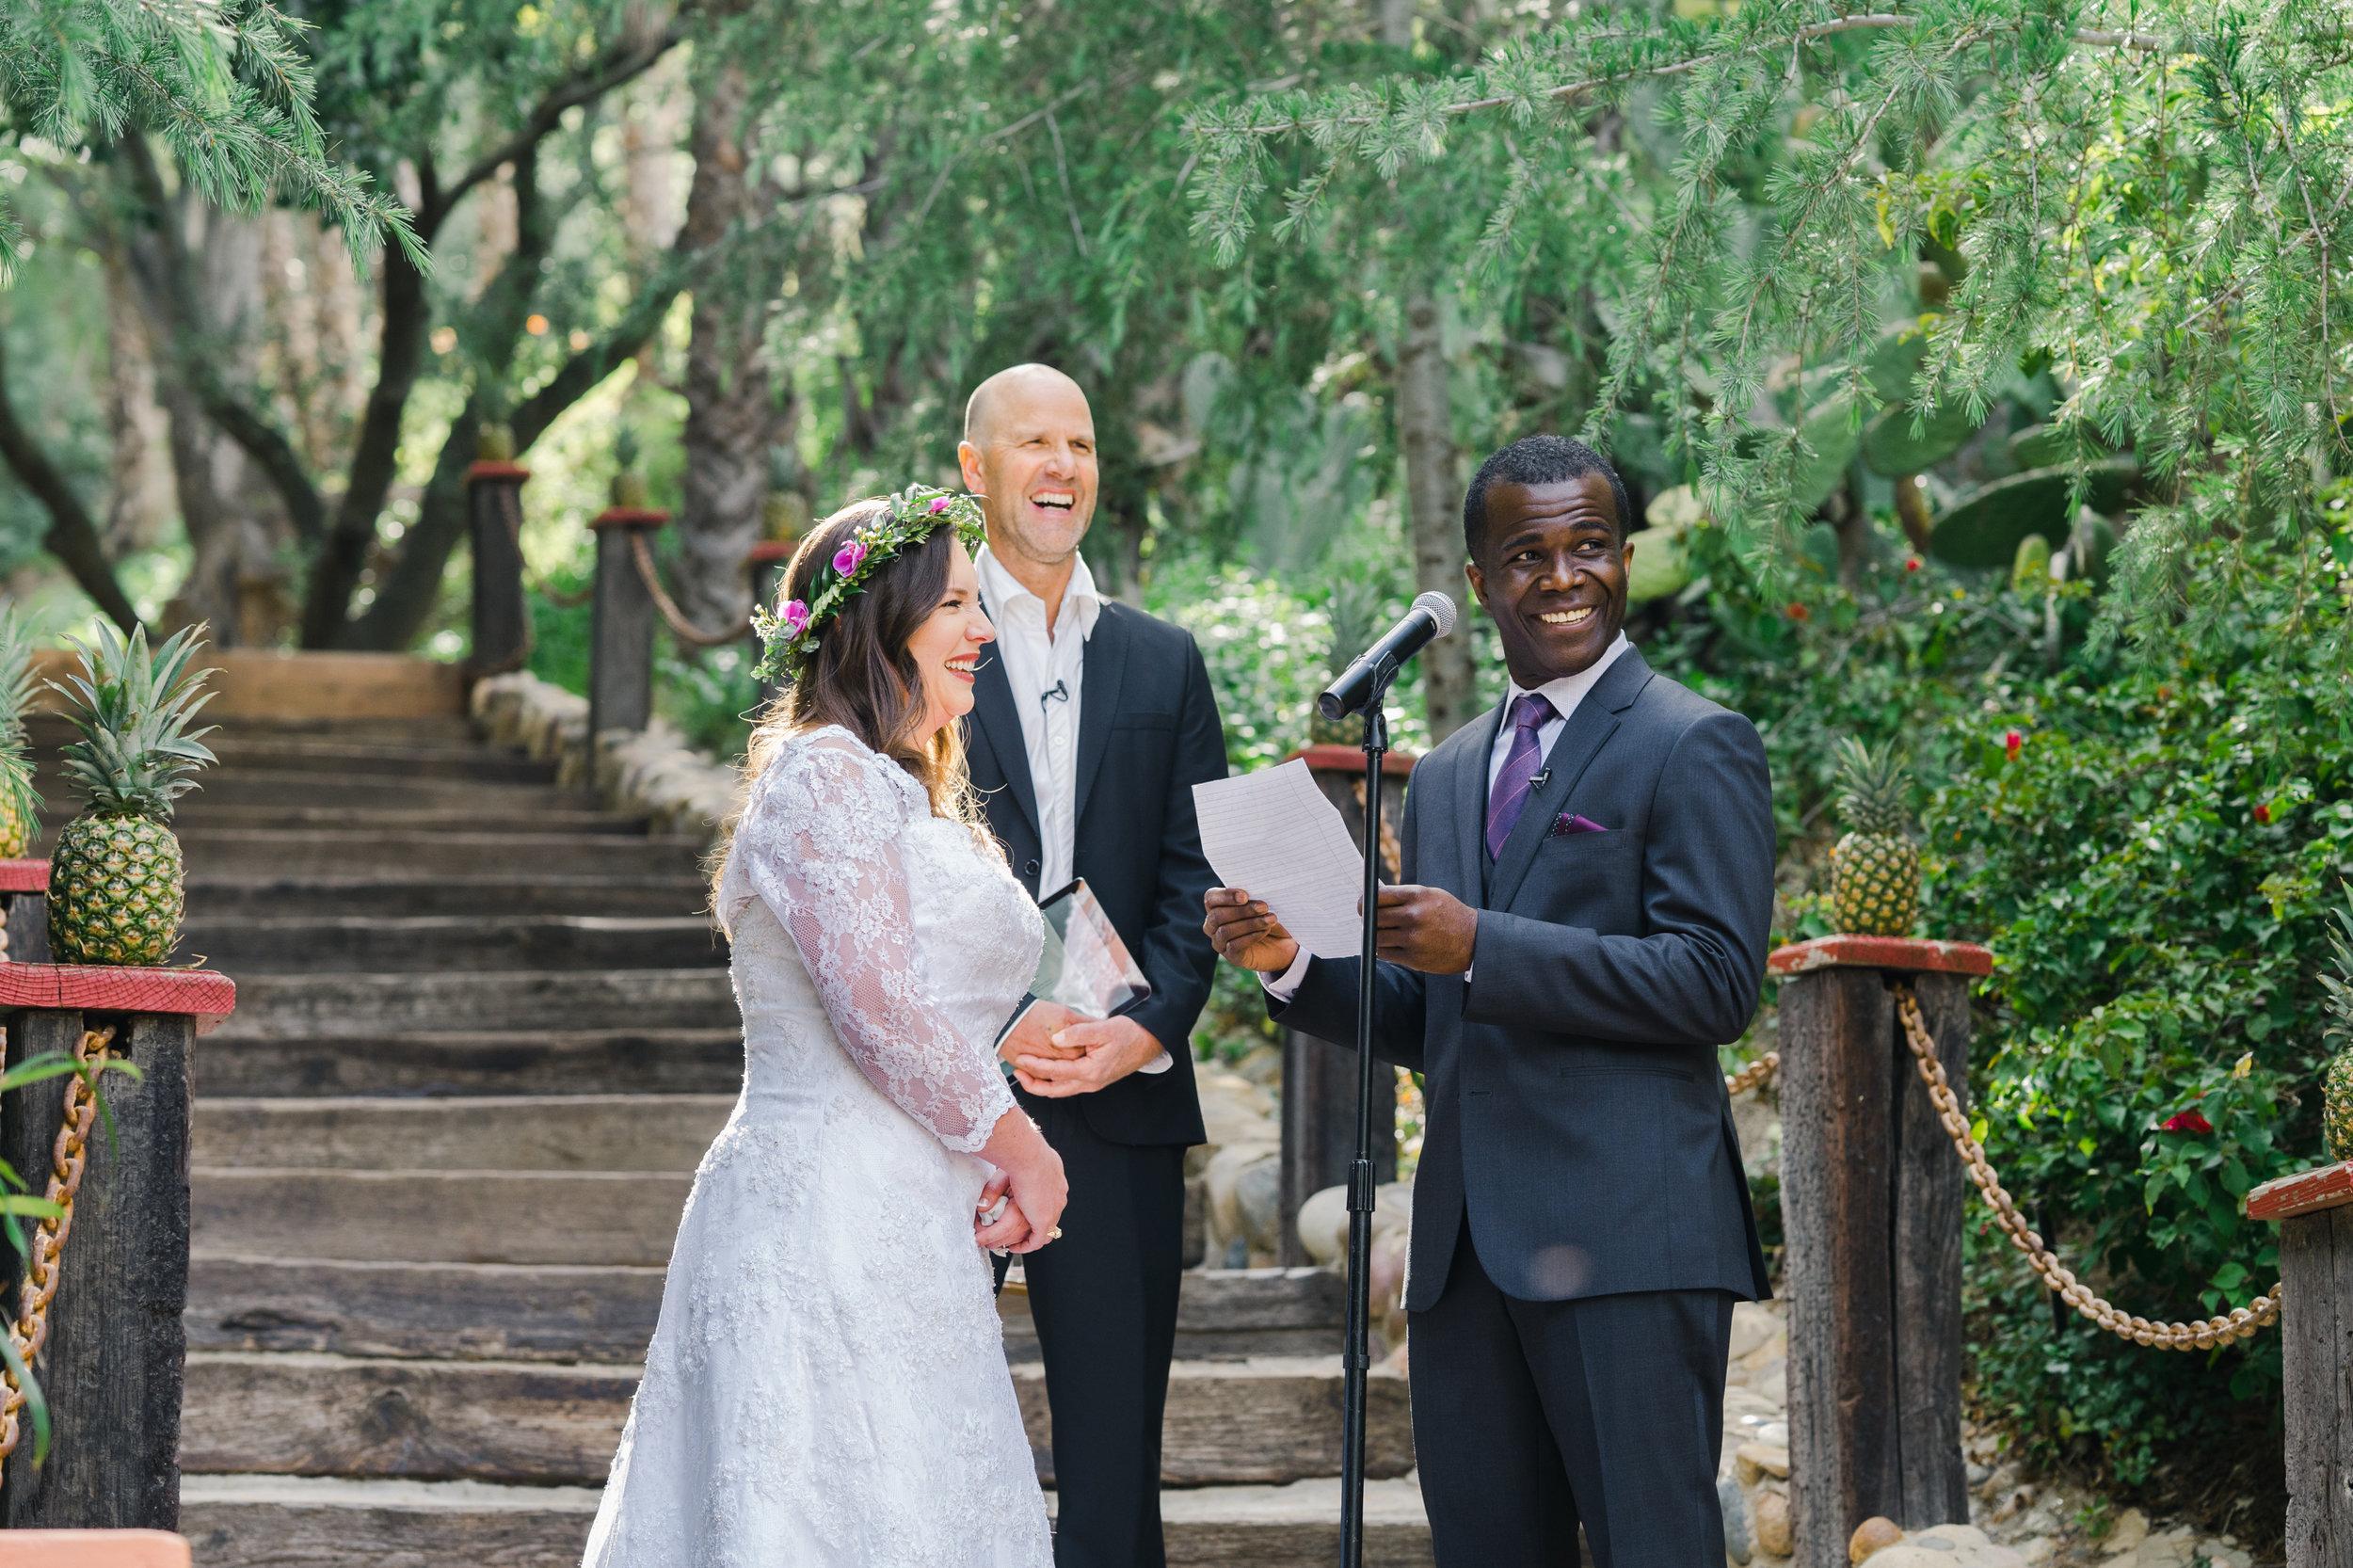 rancho-las-lomas-wedding-kelsey-sim_0129.JPG